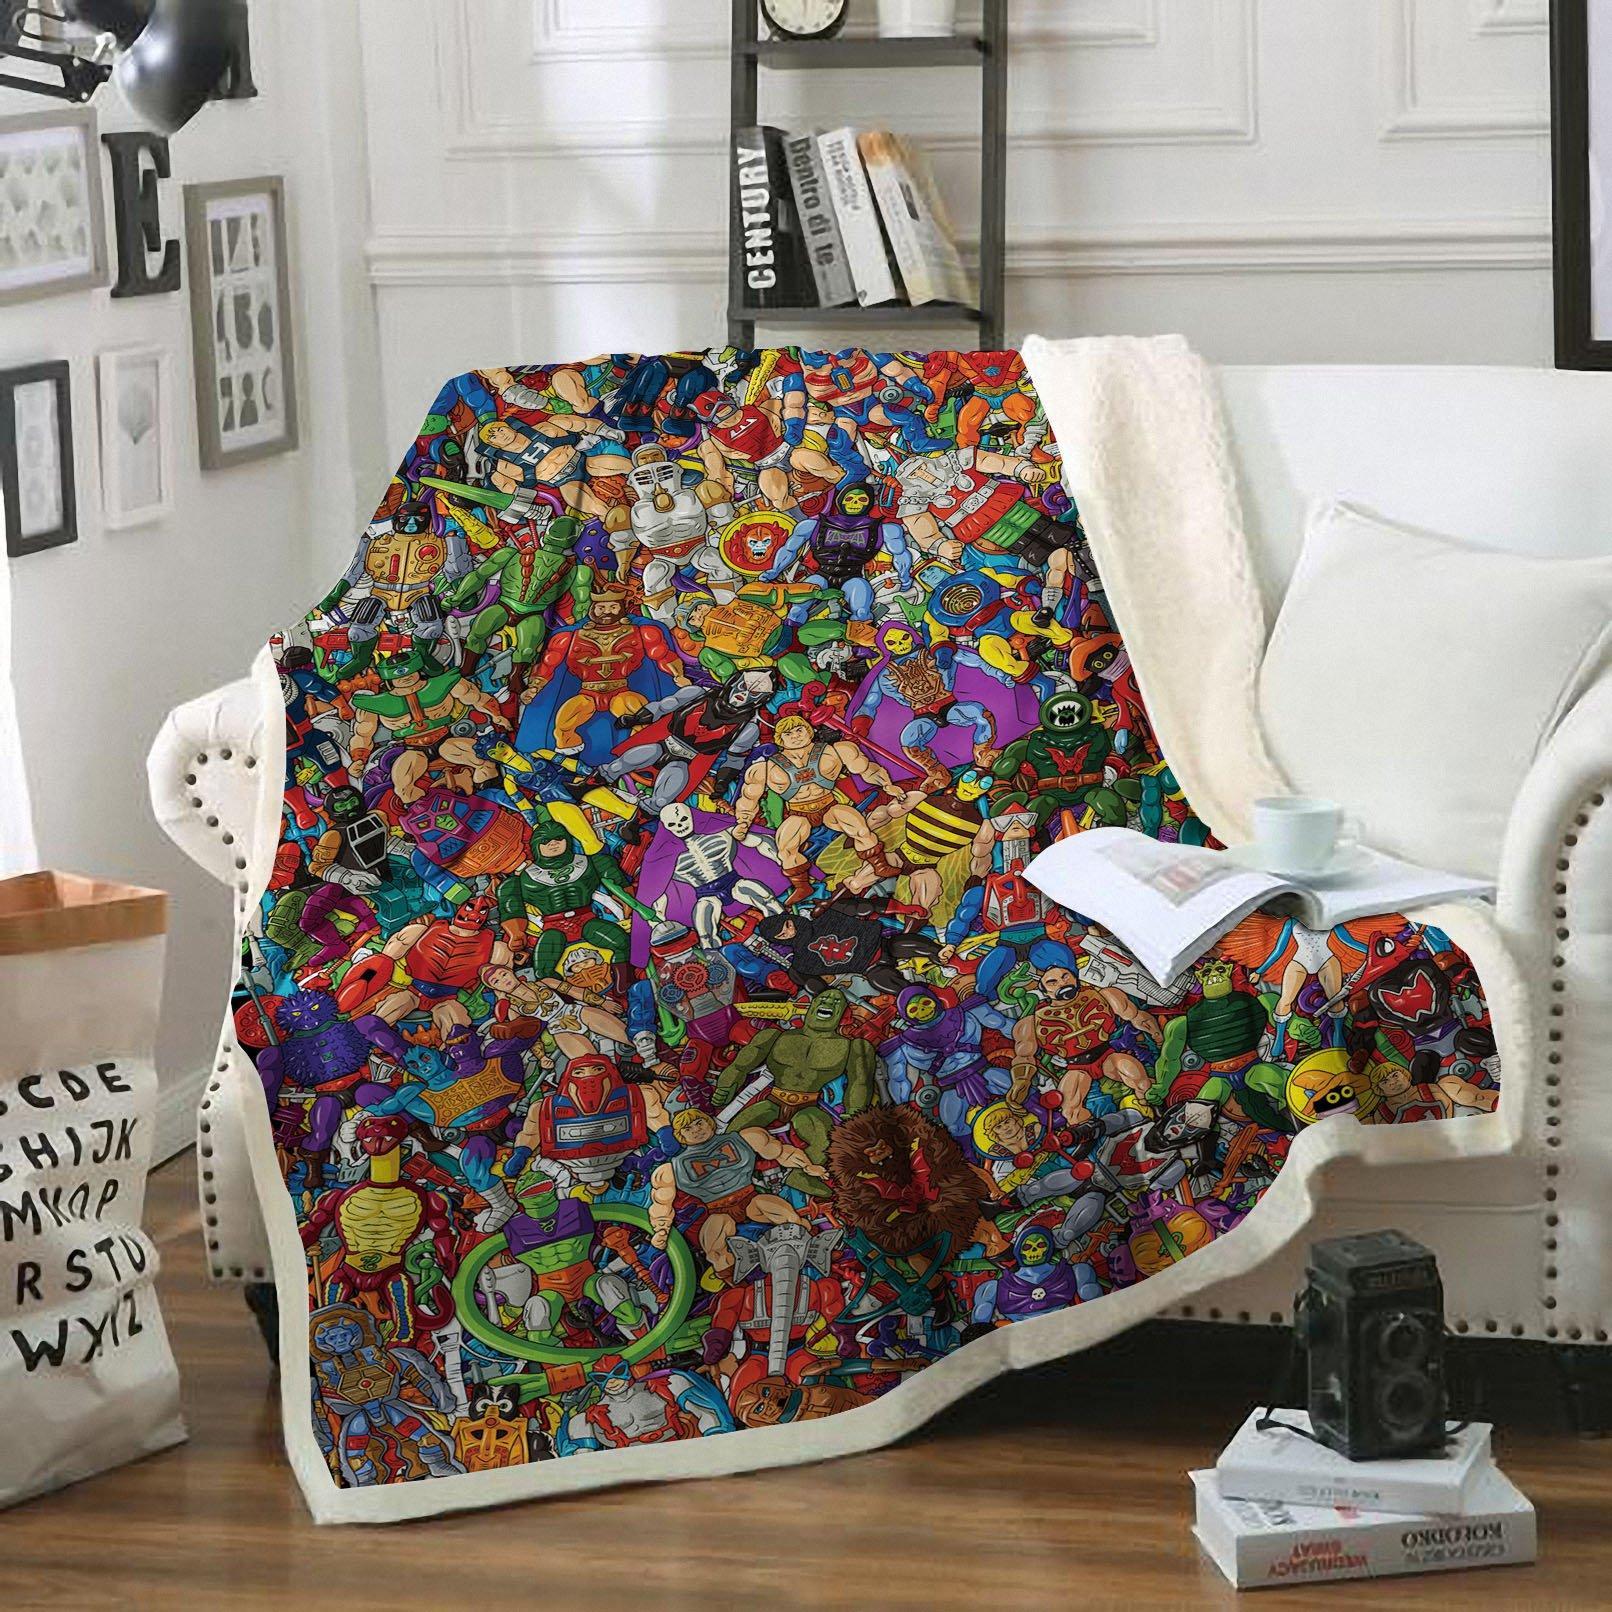 He-Man blanket - maria